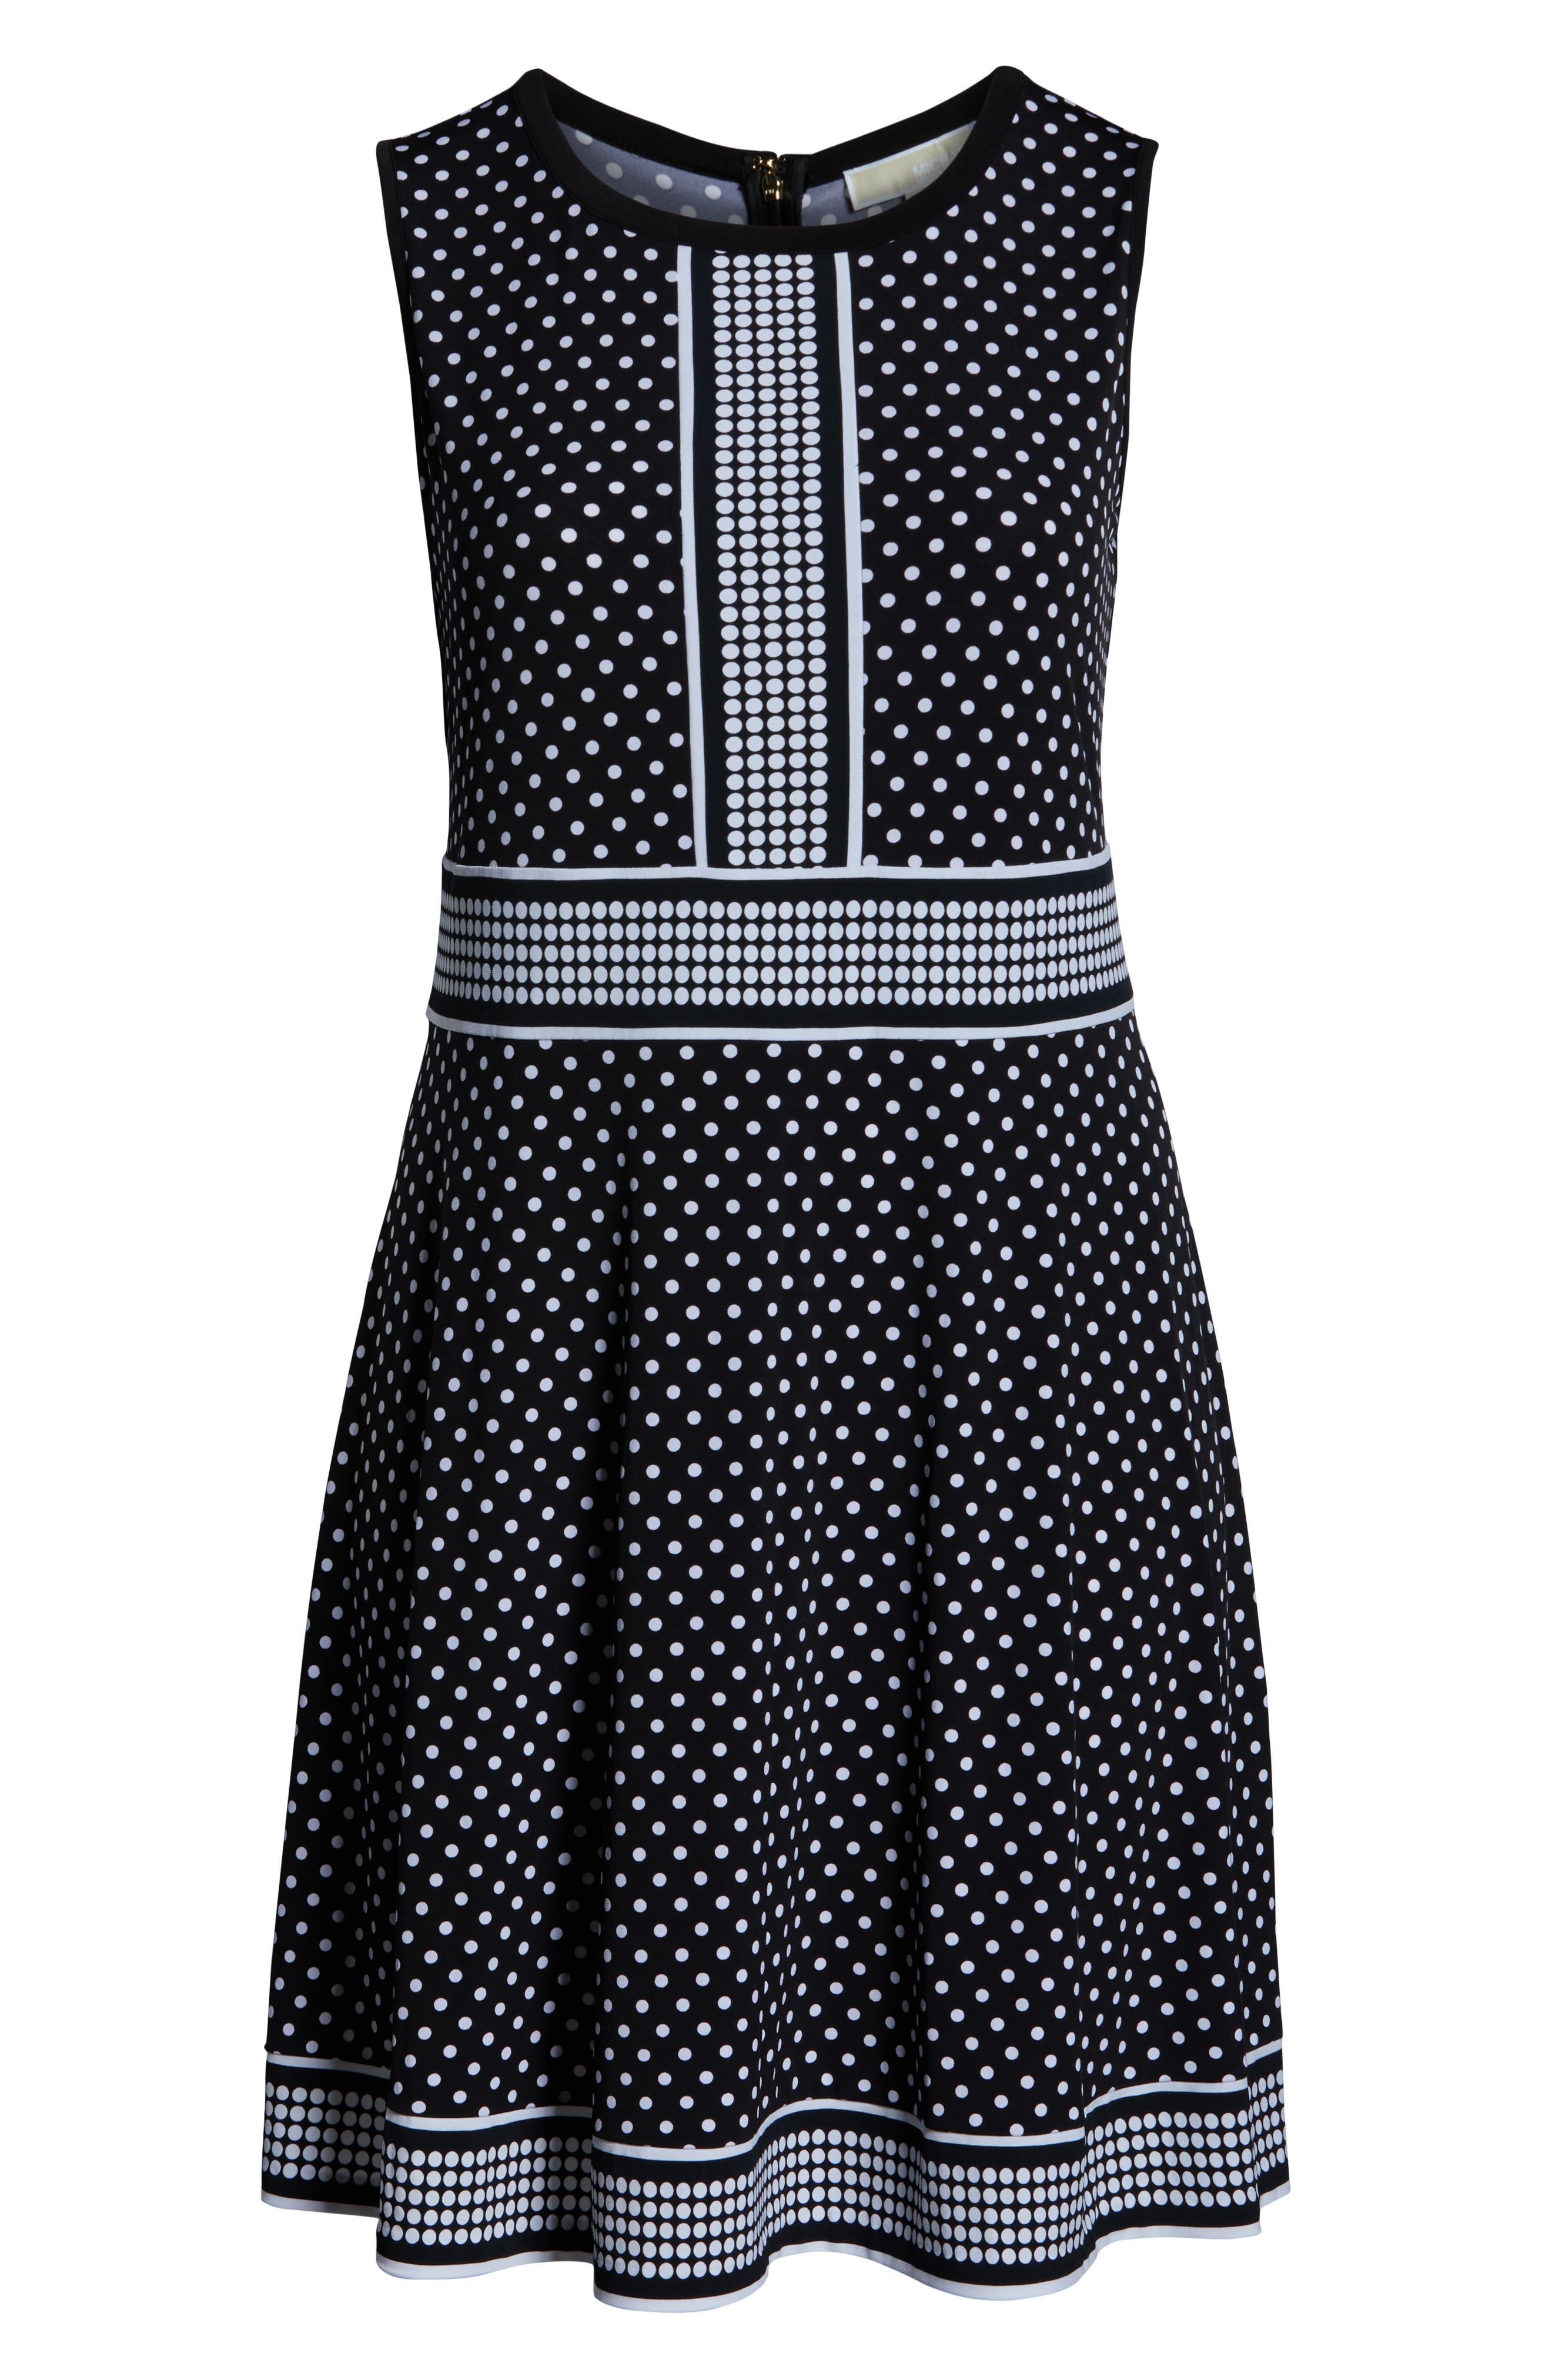 MICHAEL MICHAEL KORS, Mixed Polka Dot Dress, Alternate thumbnail 7, color, BLACK/ WHITE